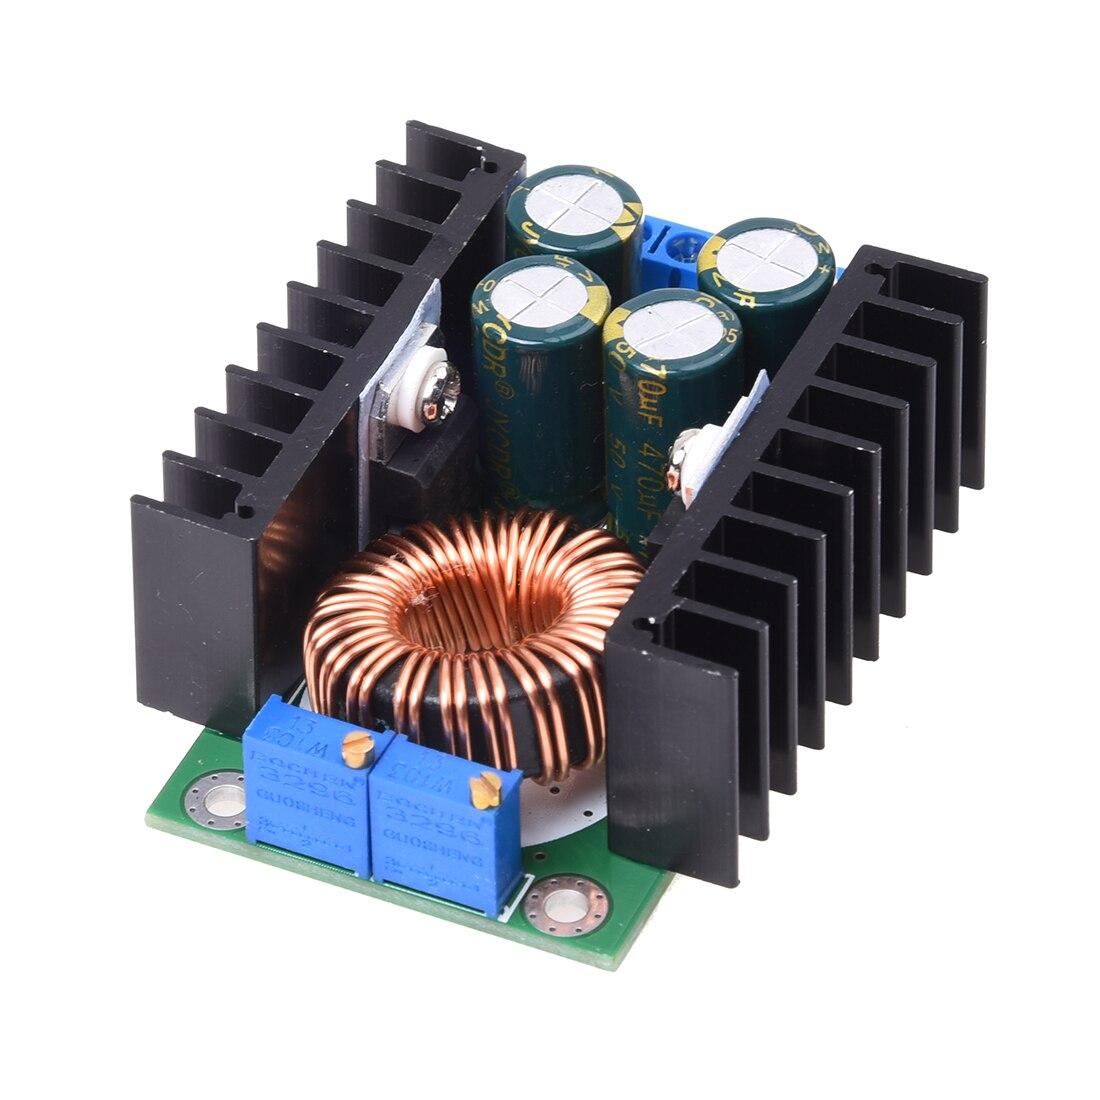 1pcs Professional Step down Power DC DC CC CV Buck Converter Step down Power Supply Module